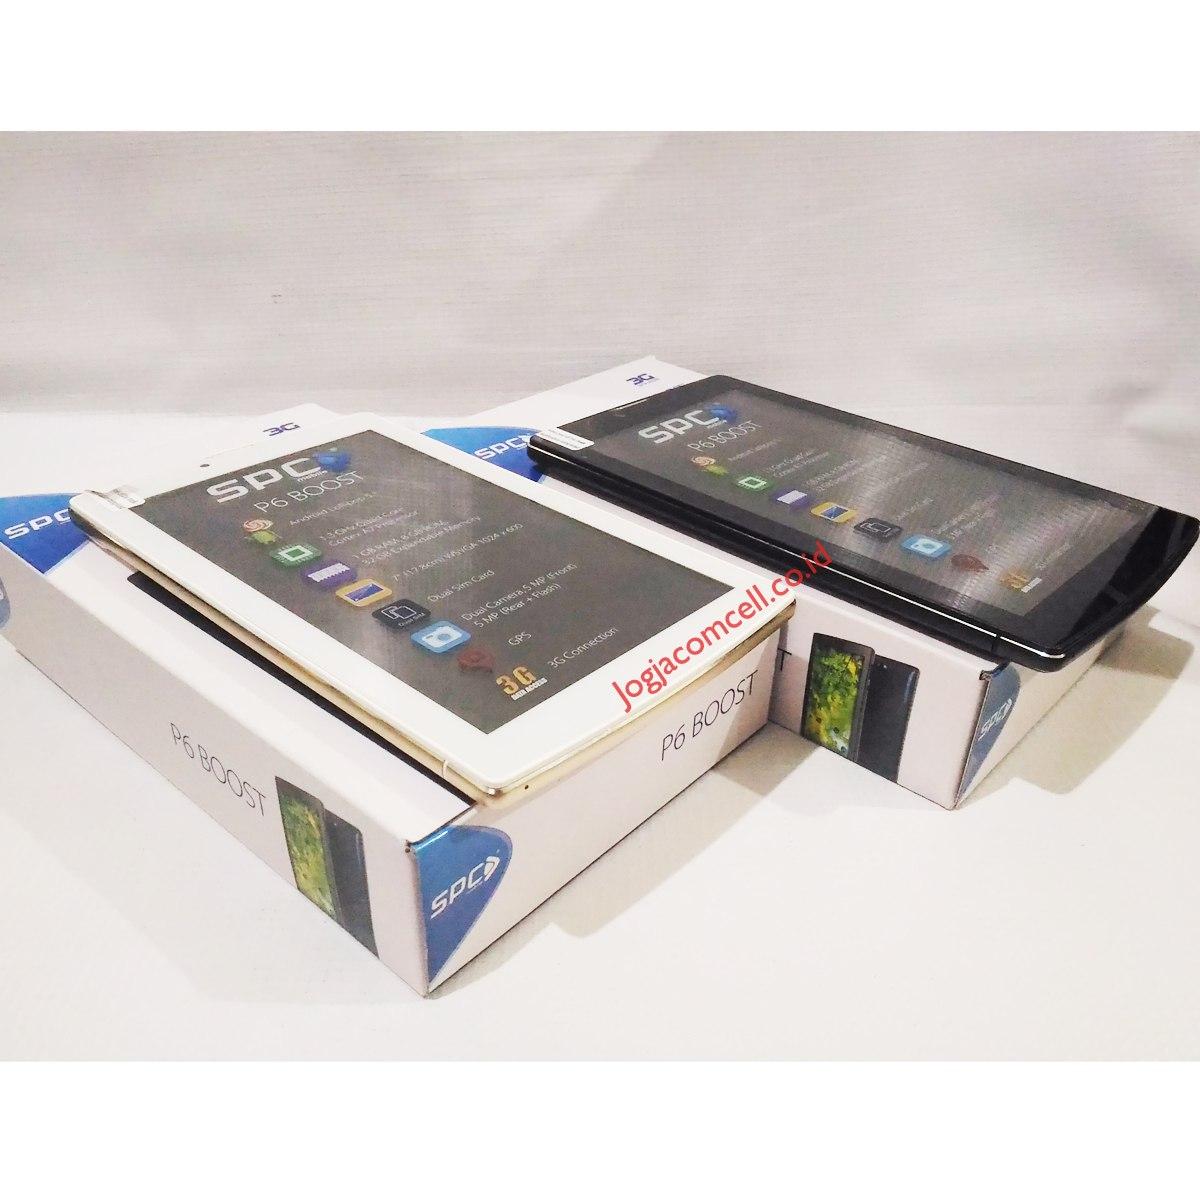 tablet spc p6 boost dual kamera